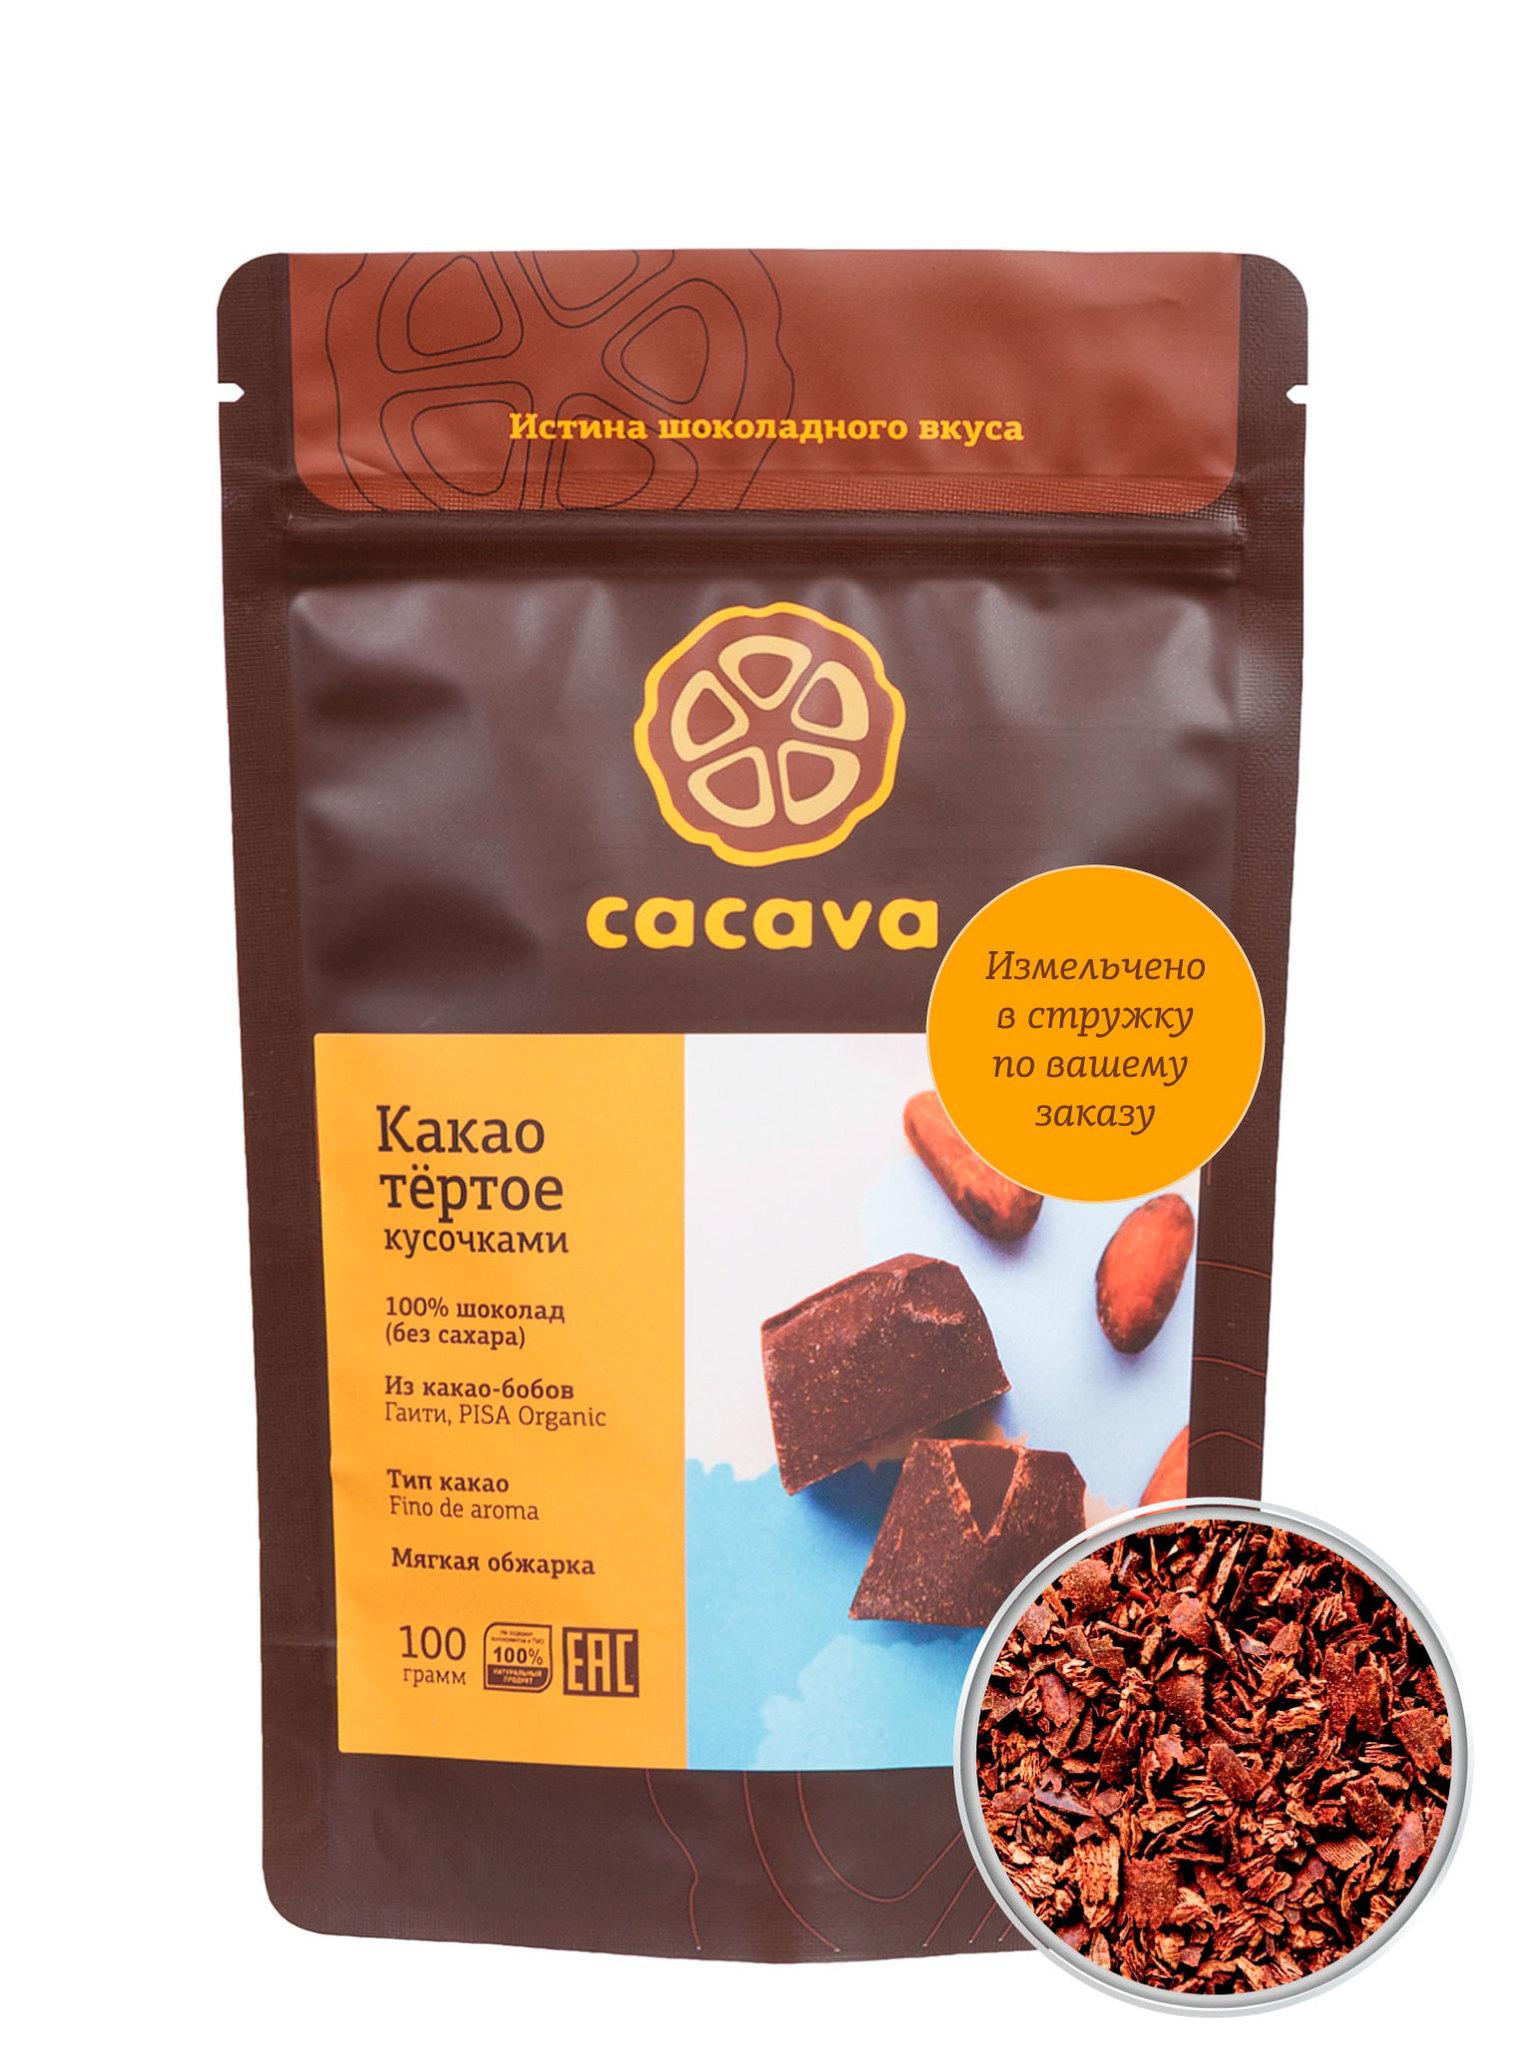 Какао тёртое в стружке (Гаити), упаковка 100 грамм